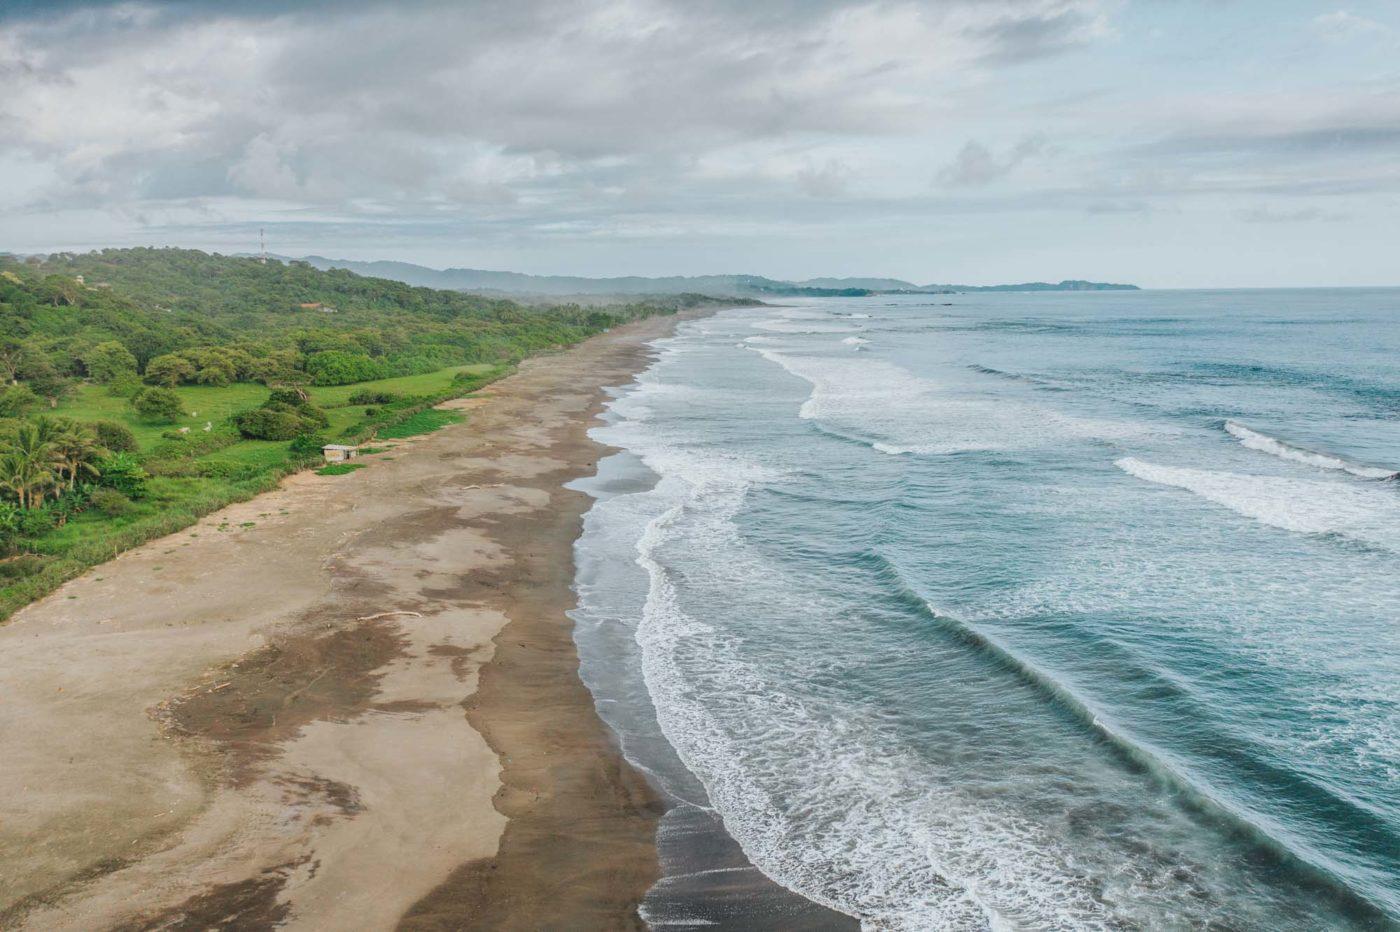 Costa Rica Guanacaste Ostional beach-0134